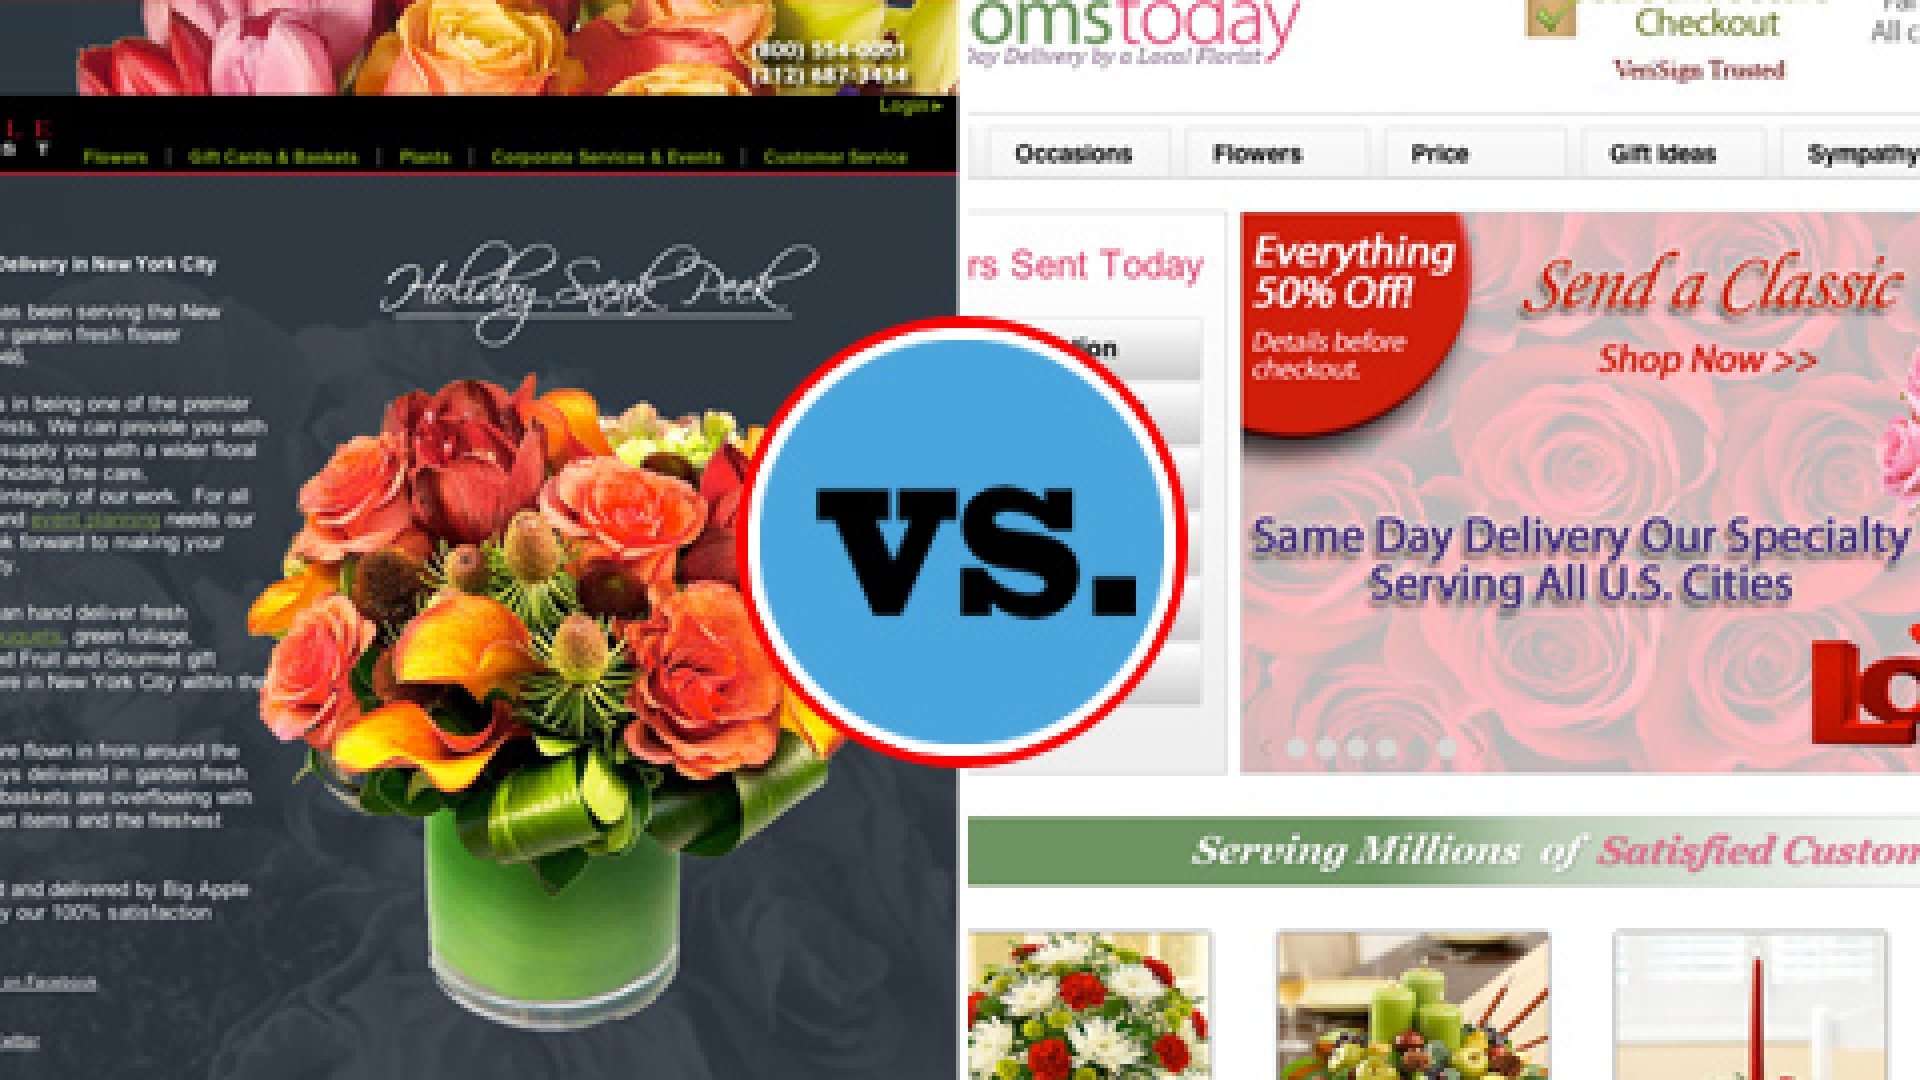 Big Apple Florist vs. Bloomstoday